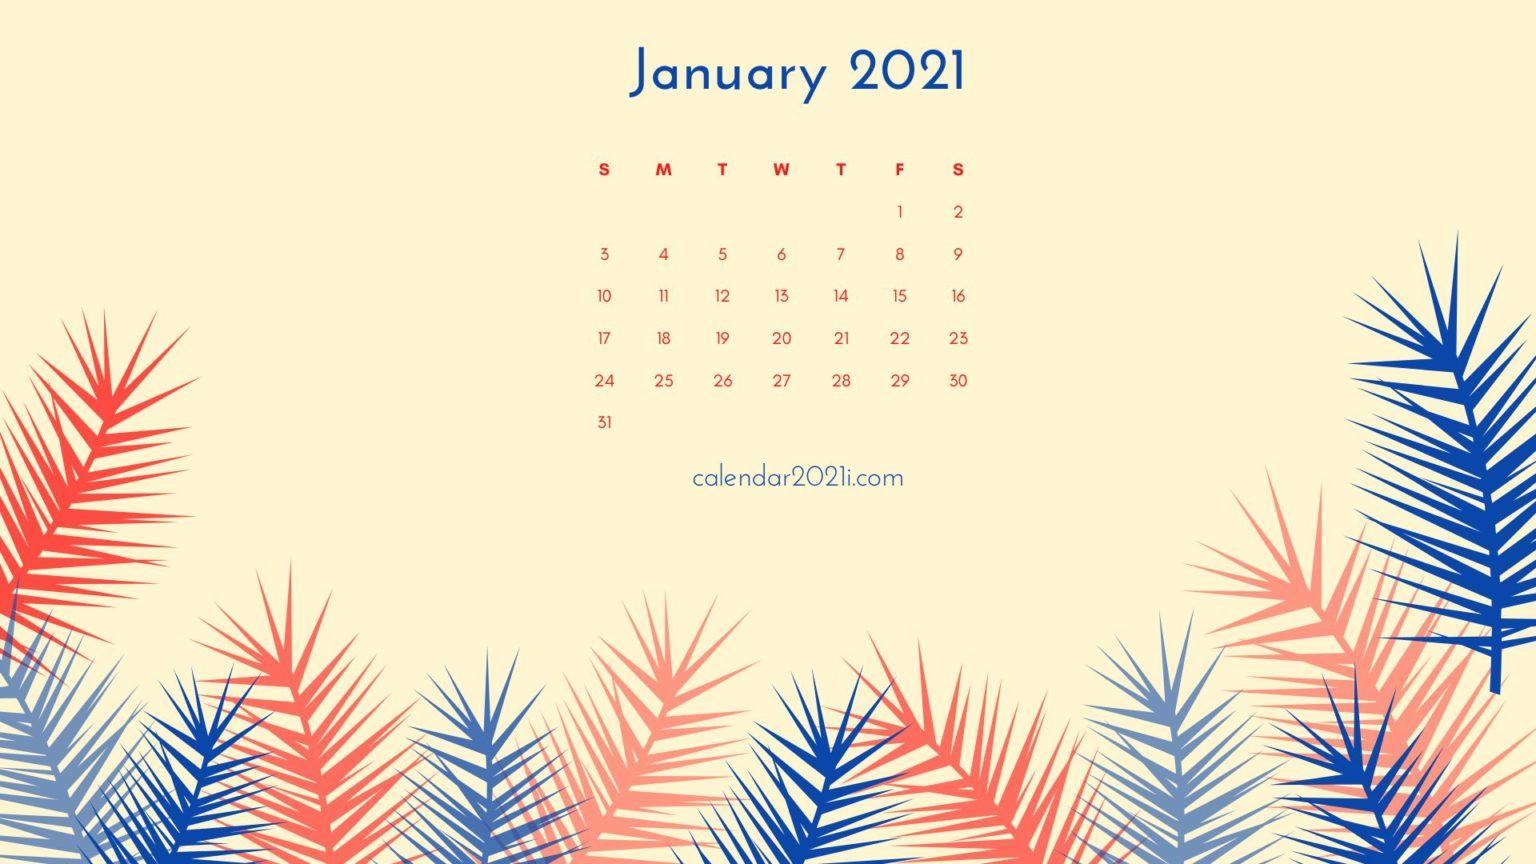 January 2021 Calendar Wallpapers Download Calendar 2021 1536x864